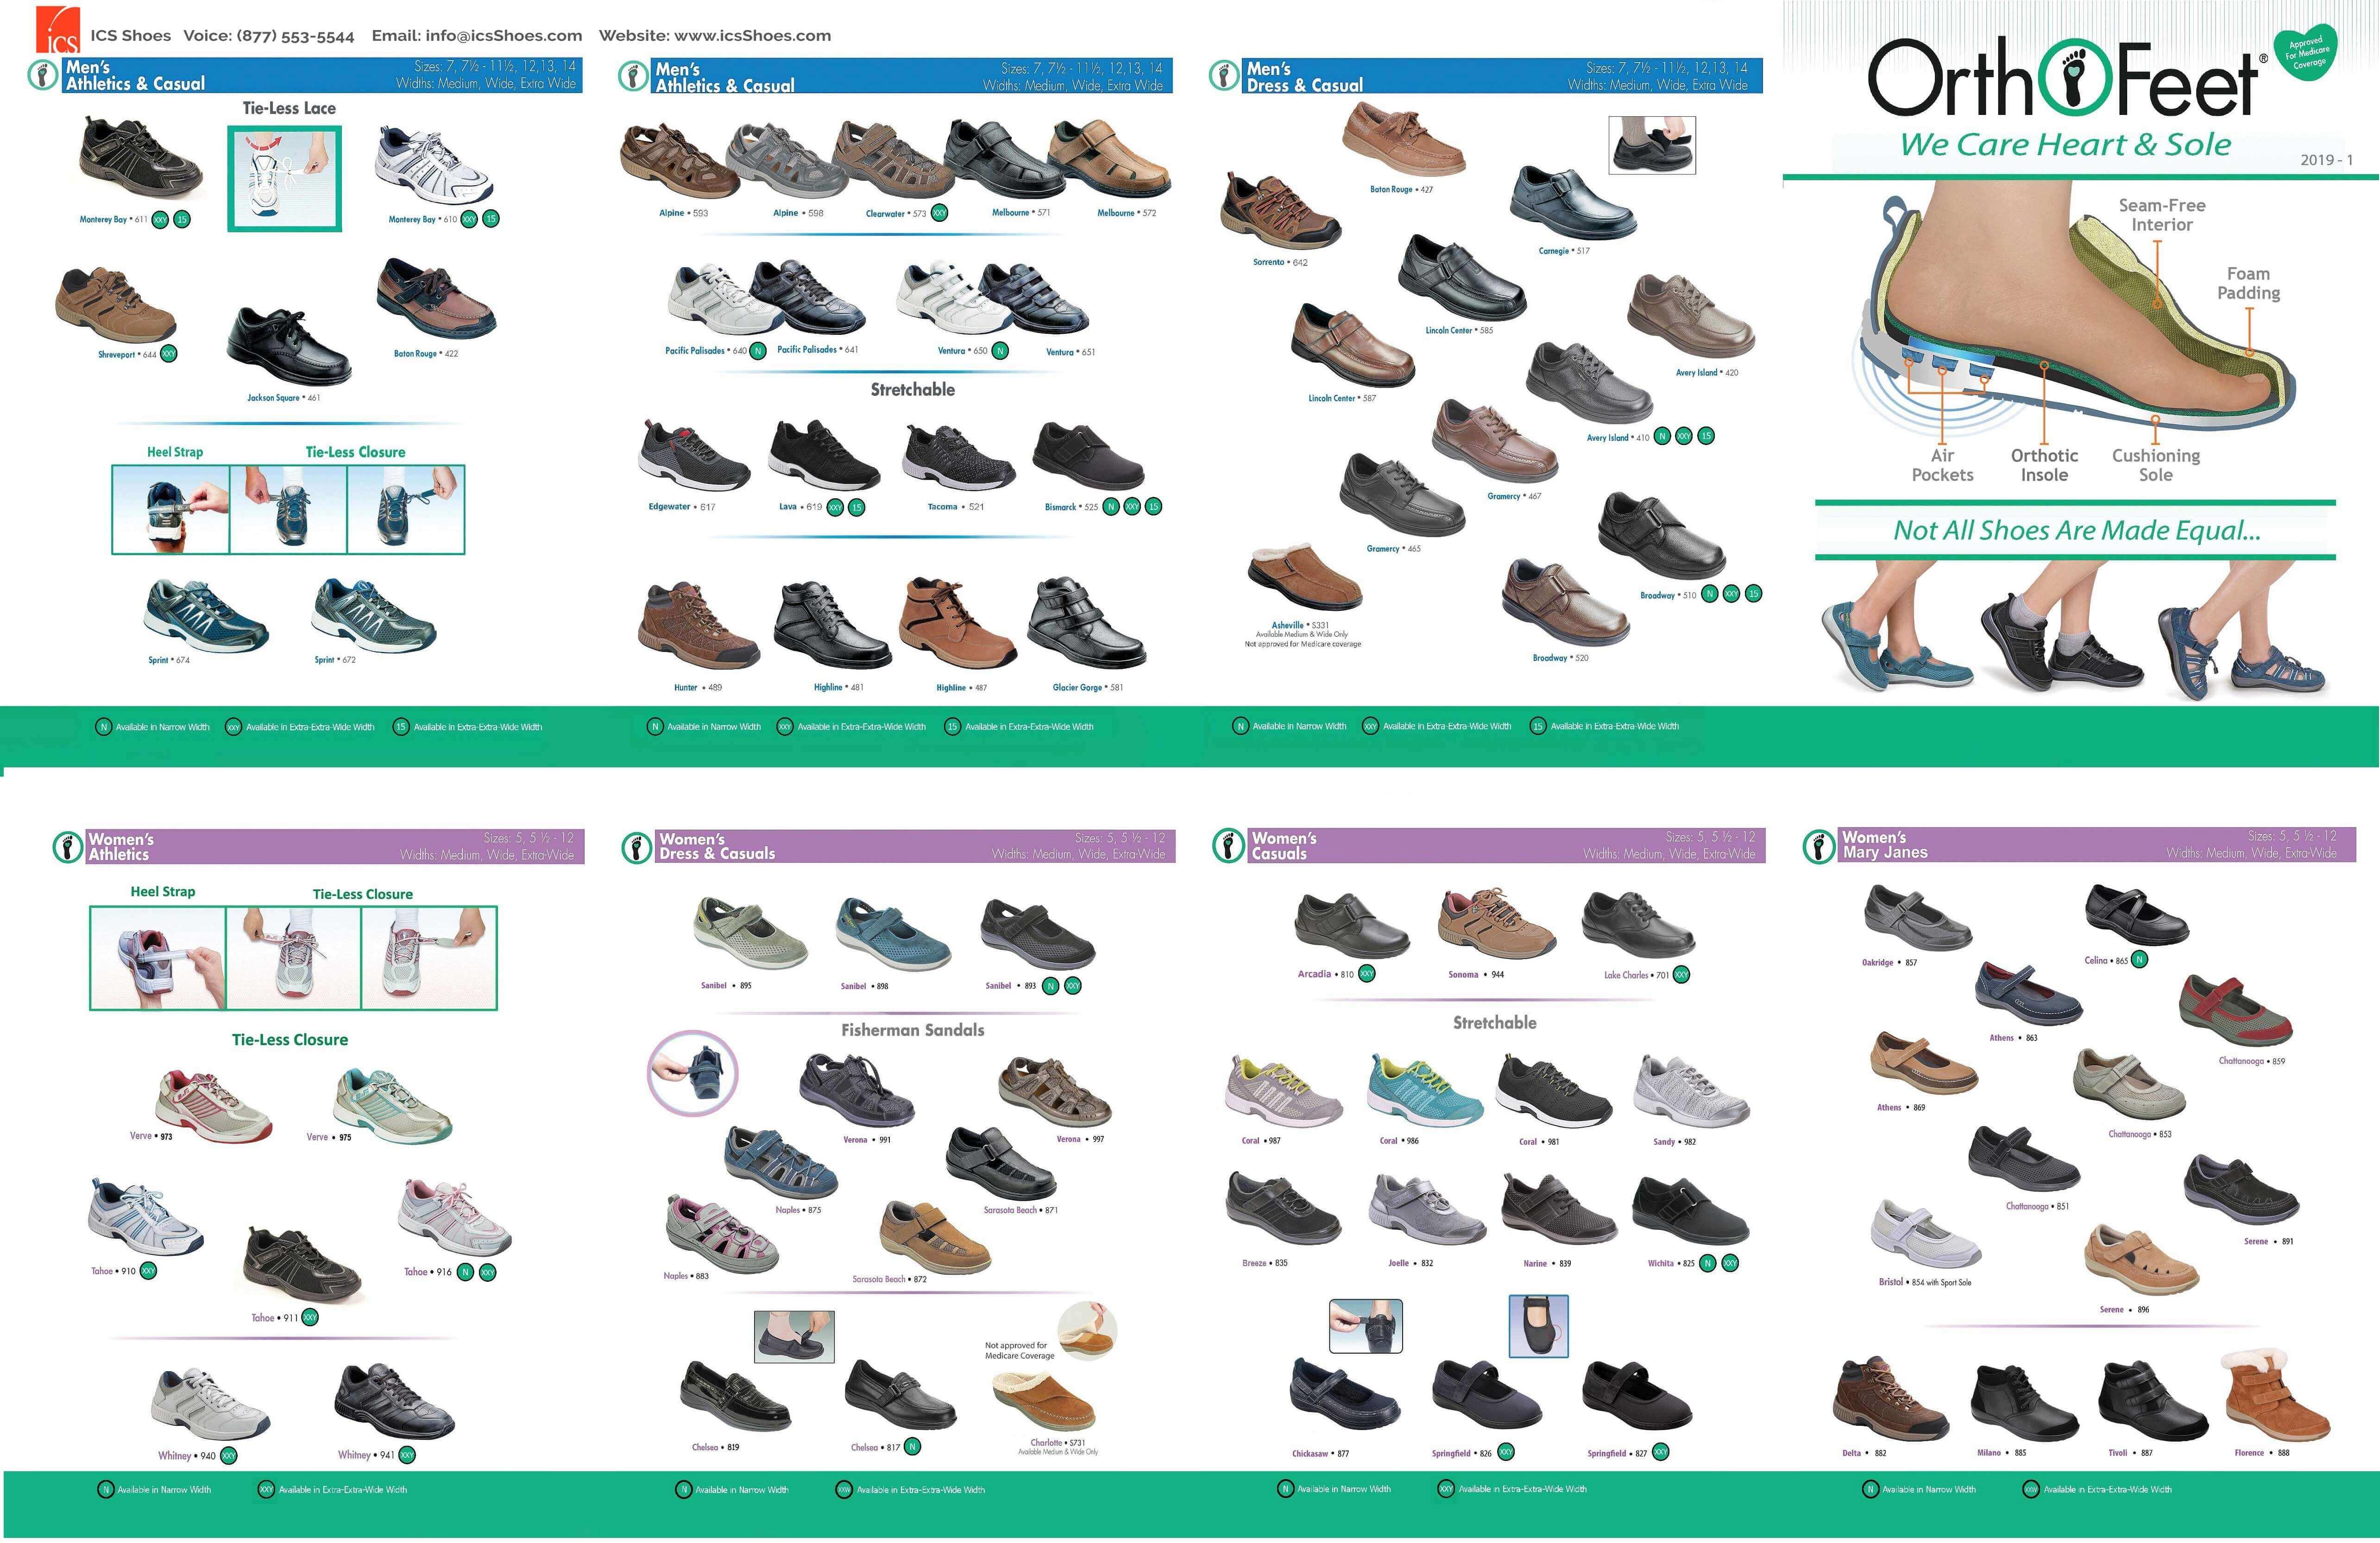 7a9b2a0de8600 Orthofeet Shoes